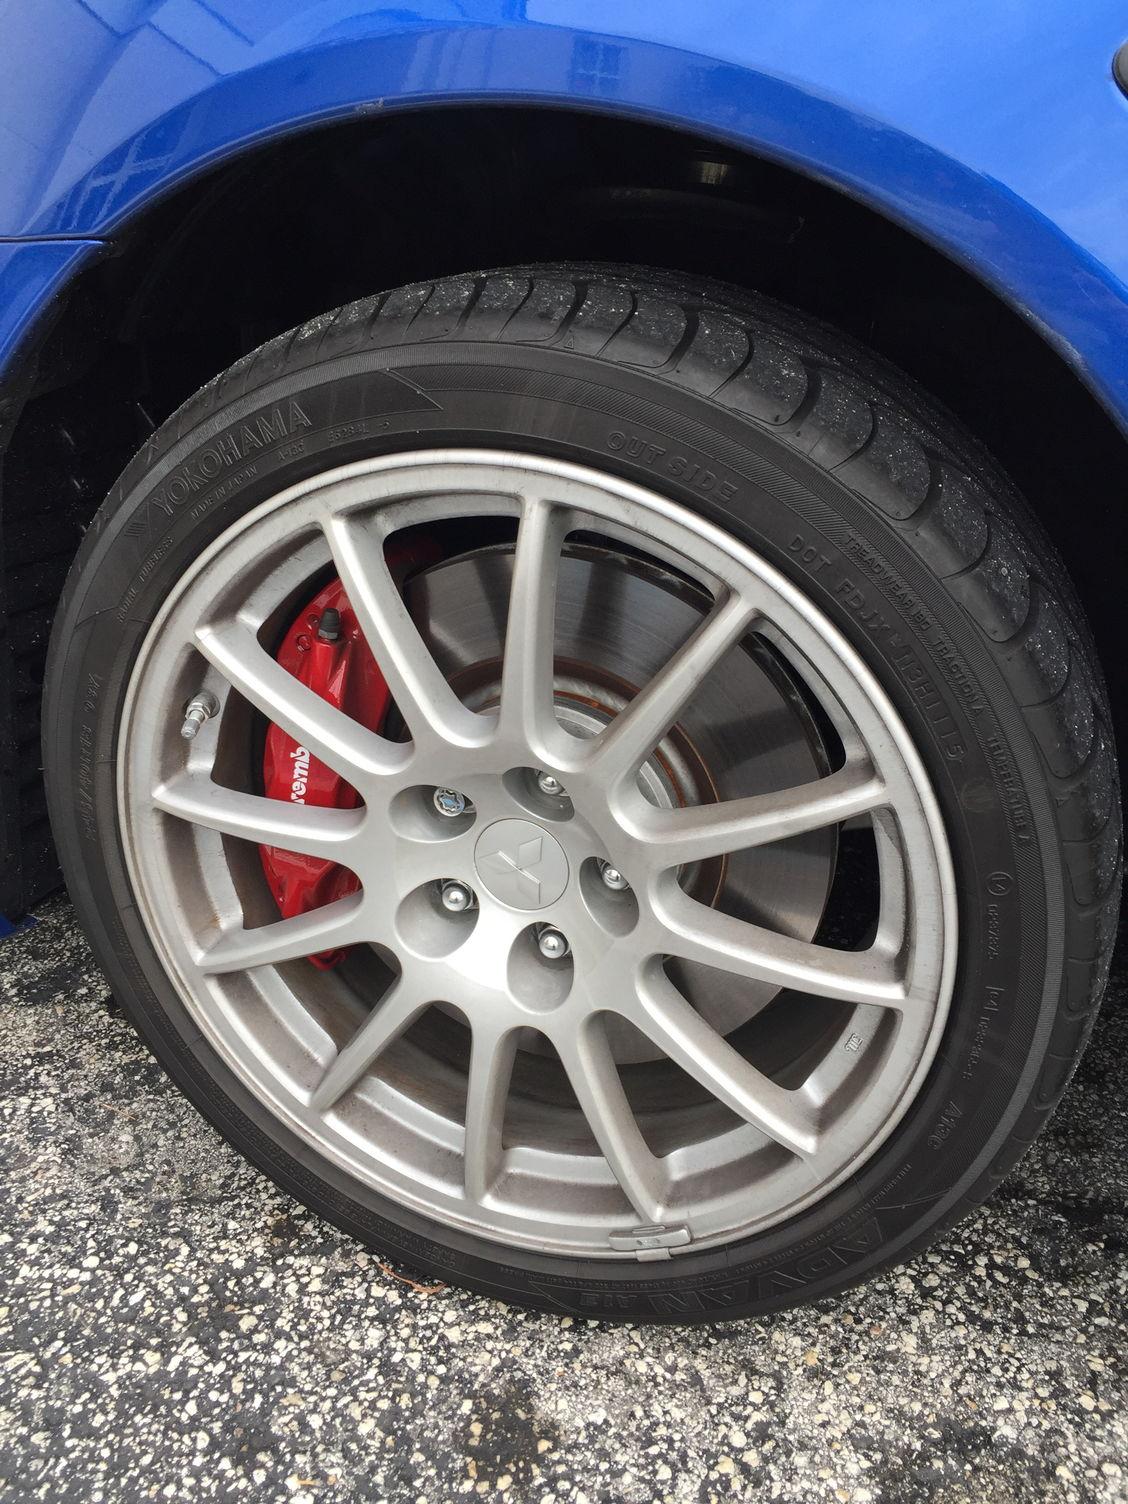 fs southeast or trade florida stock evo x wheels tires cash for after market tires. Black Bedroom Furniture Sets. Home Design Ideas